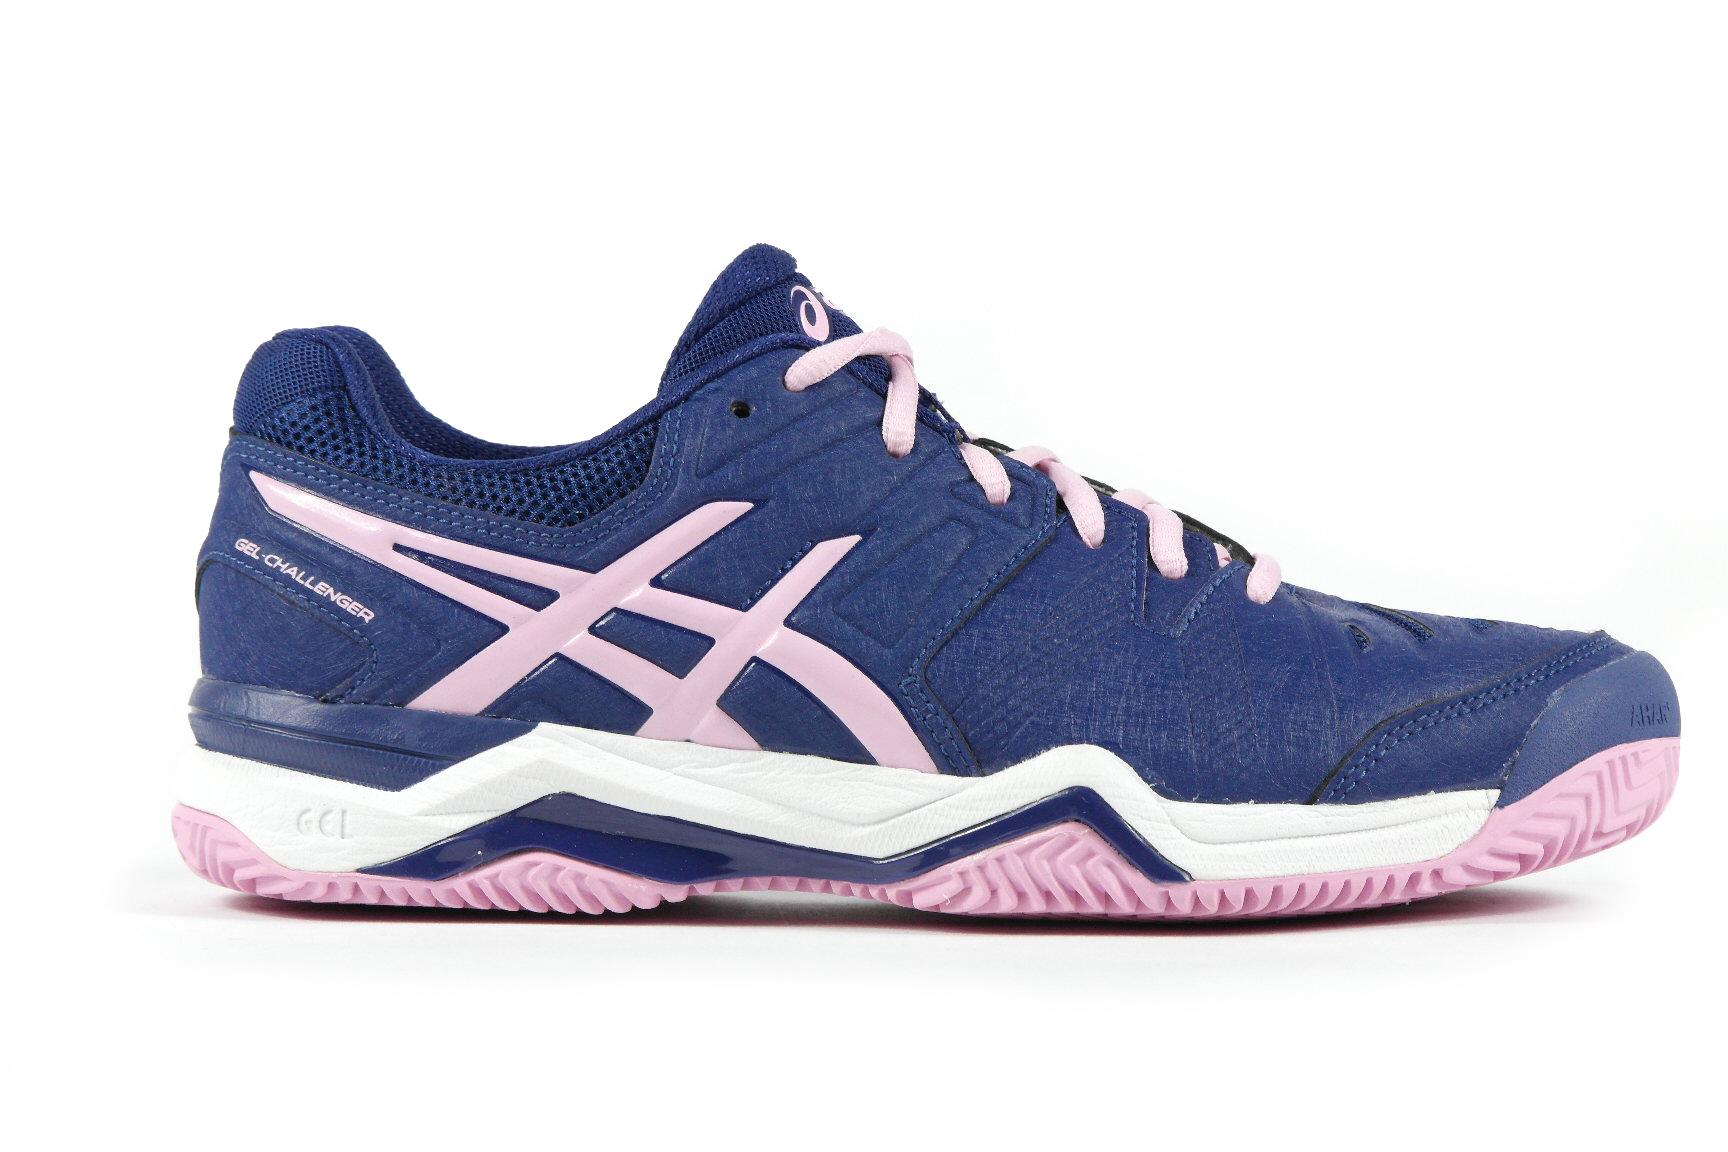 asics schoenen dames blauw